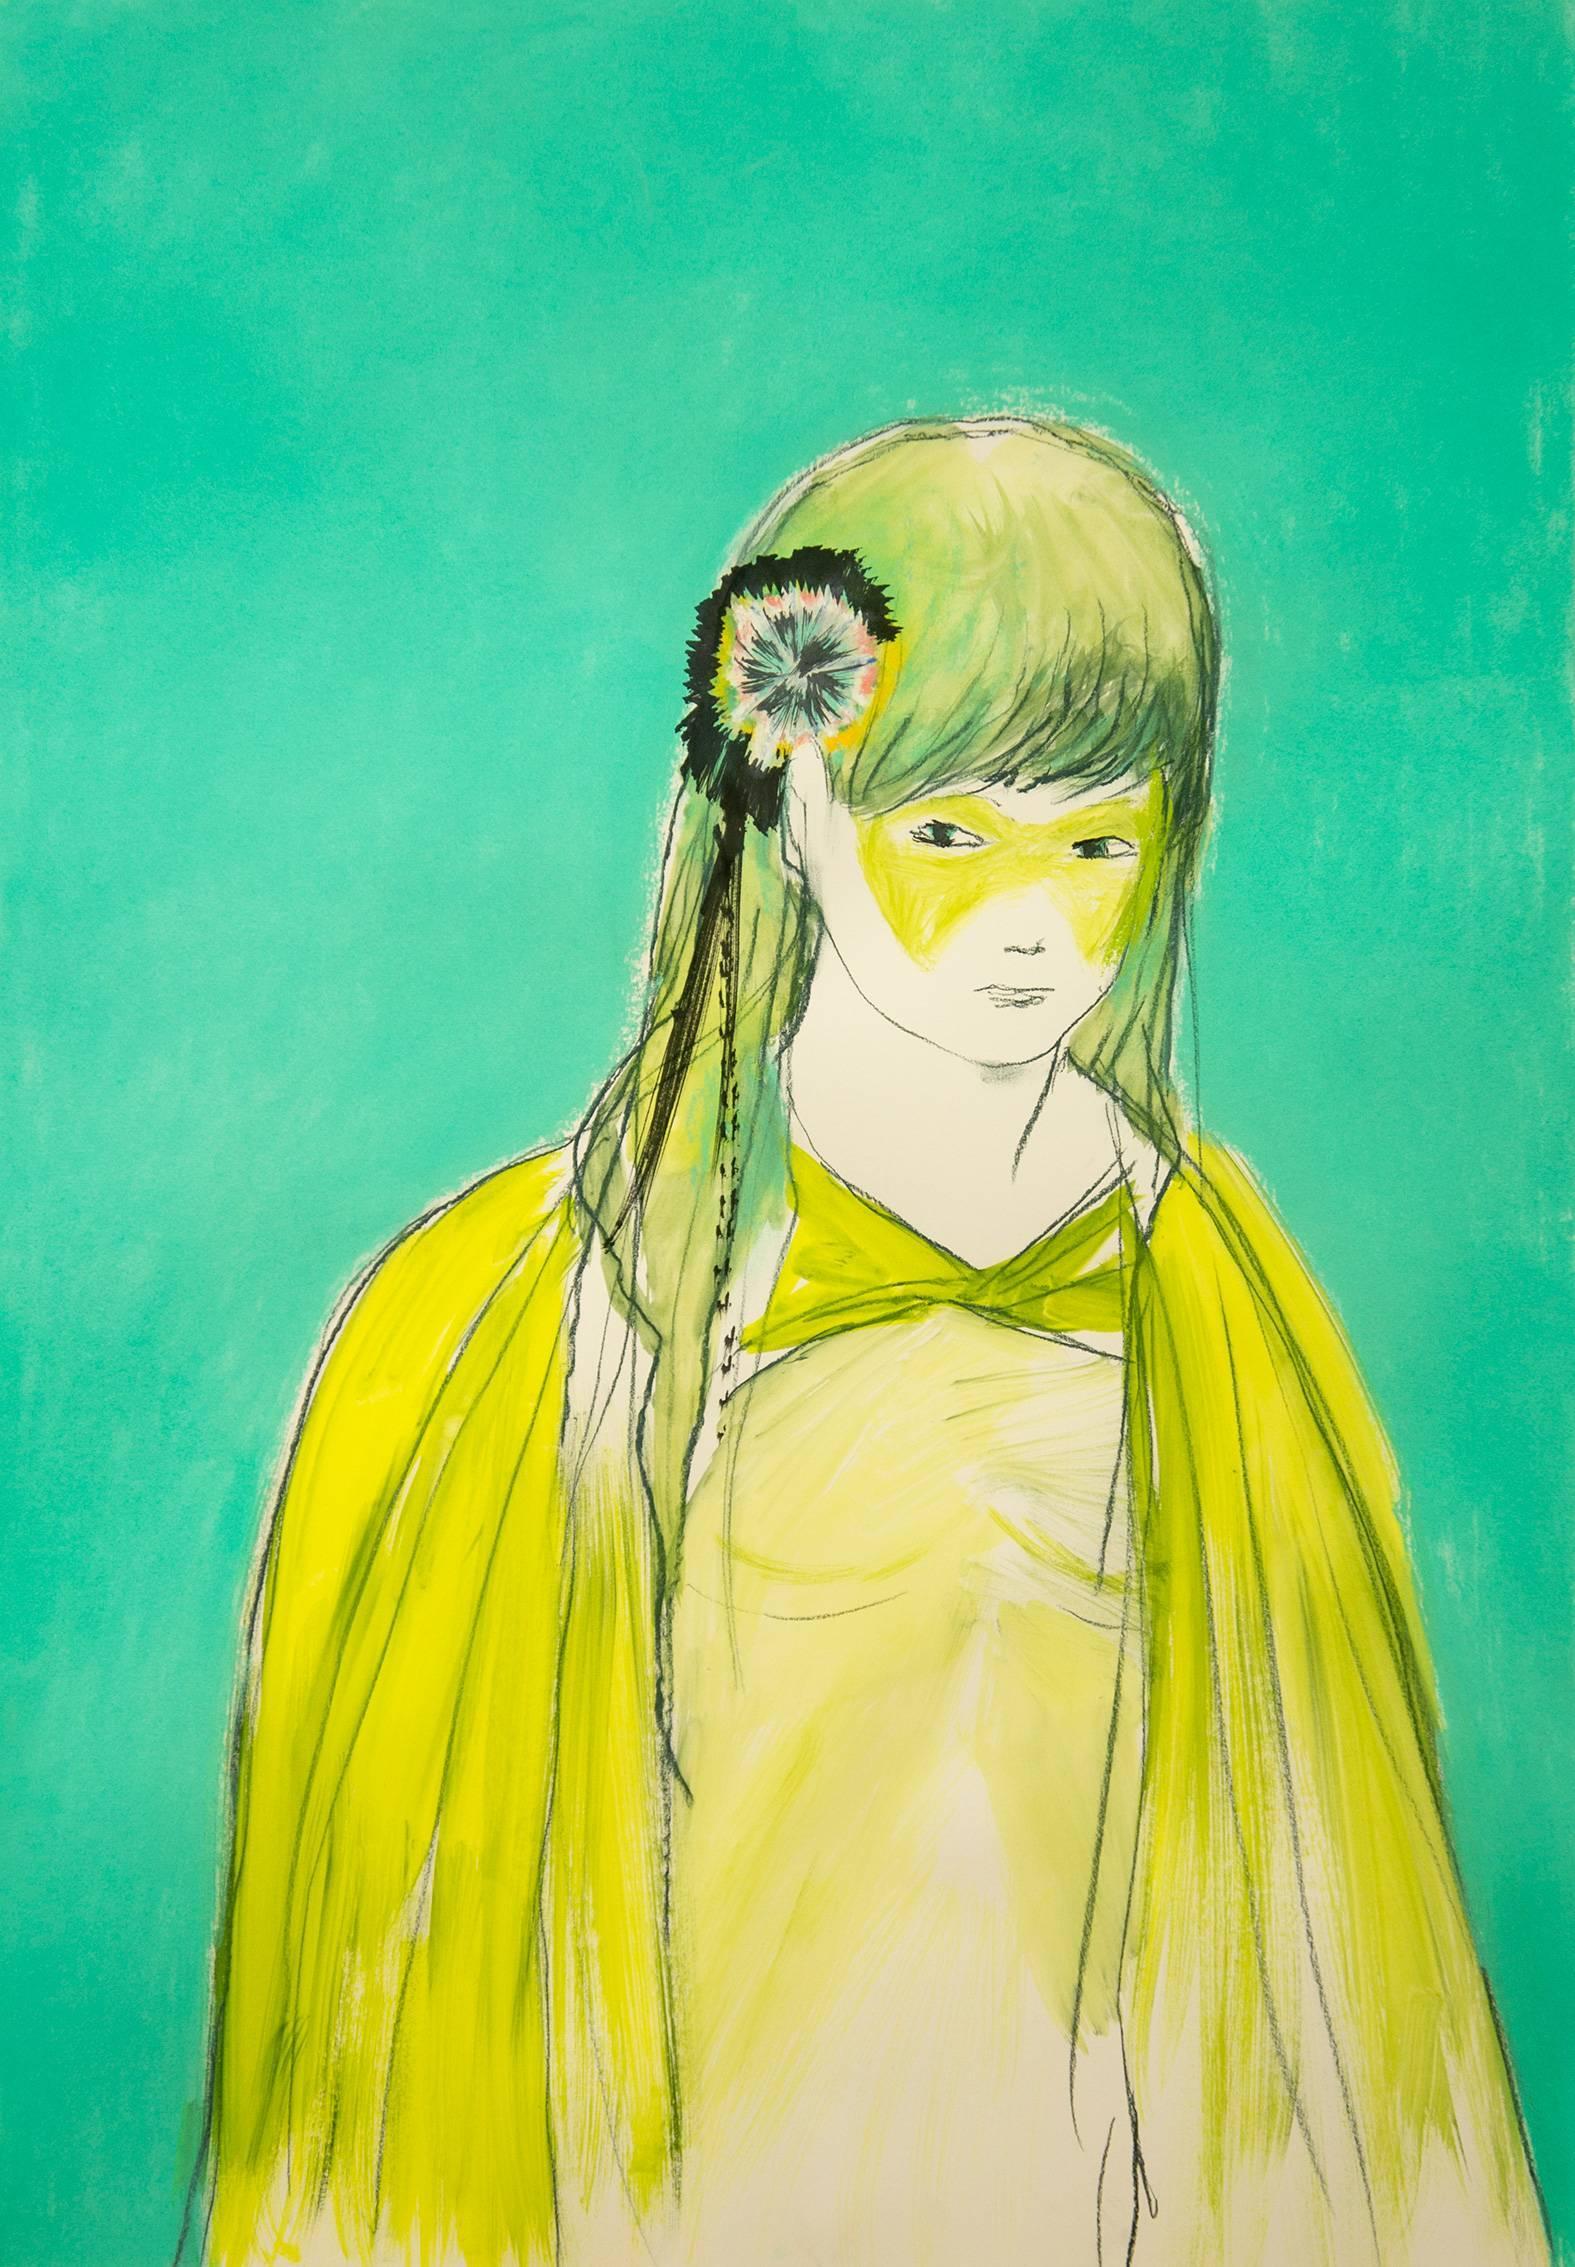 Eduardo Infante, Emerald Heroine, 2017